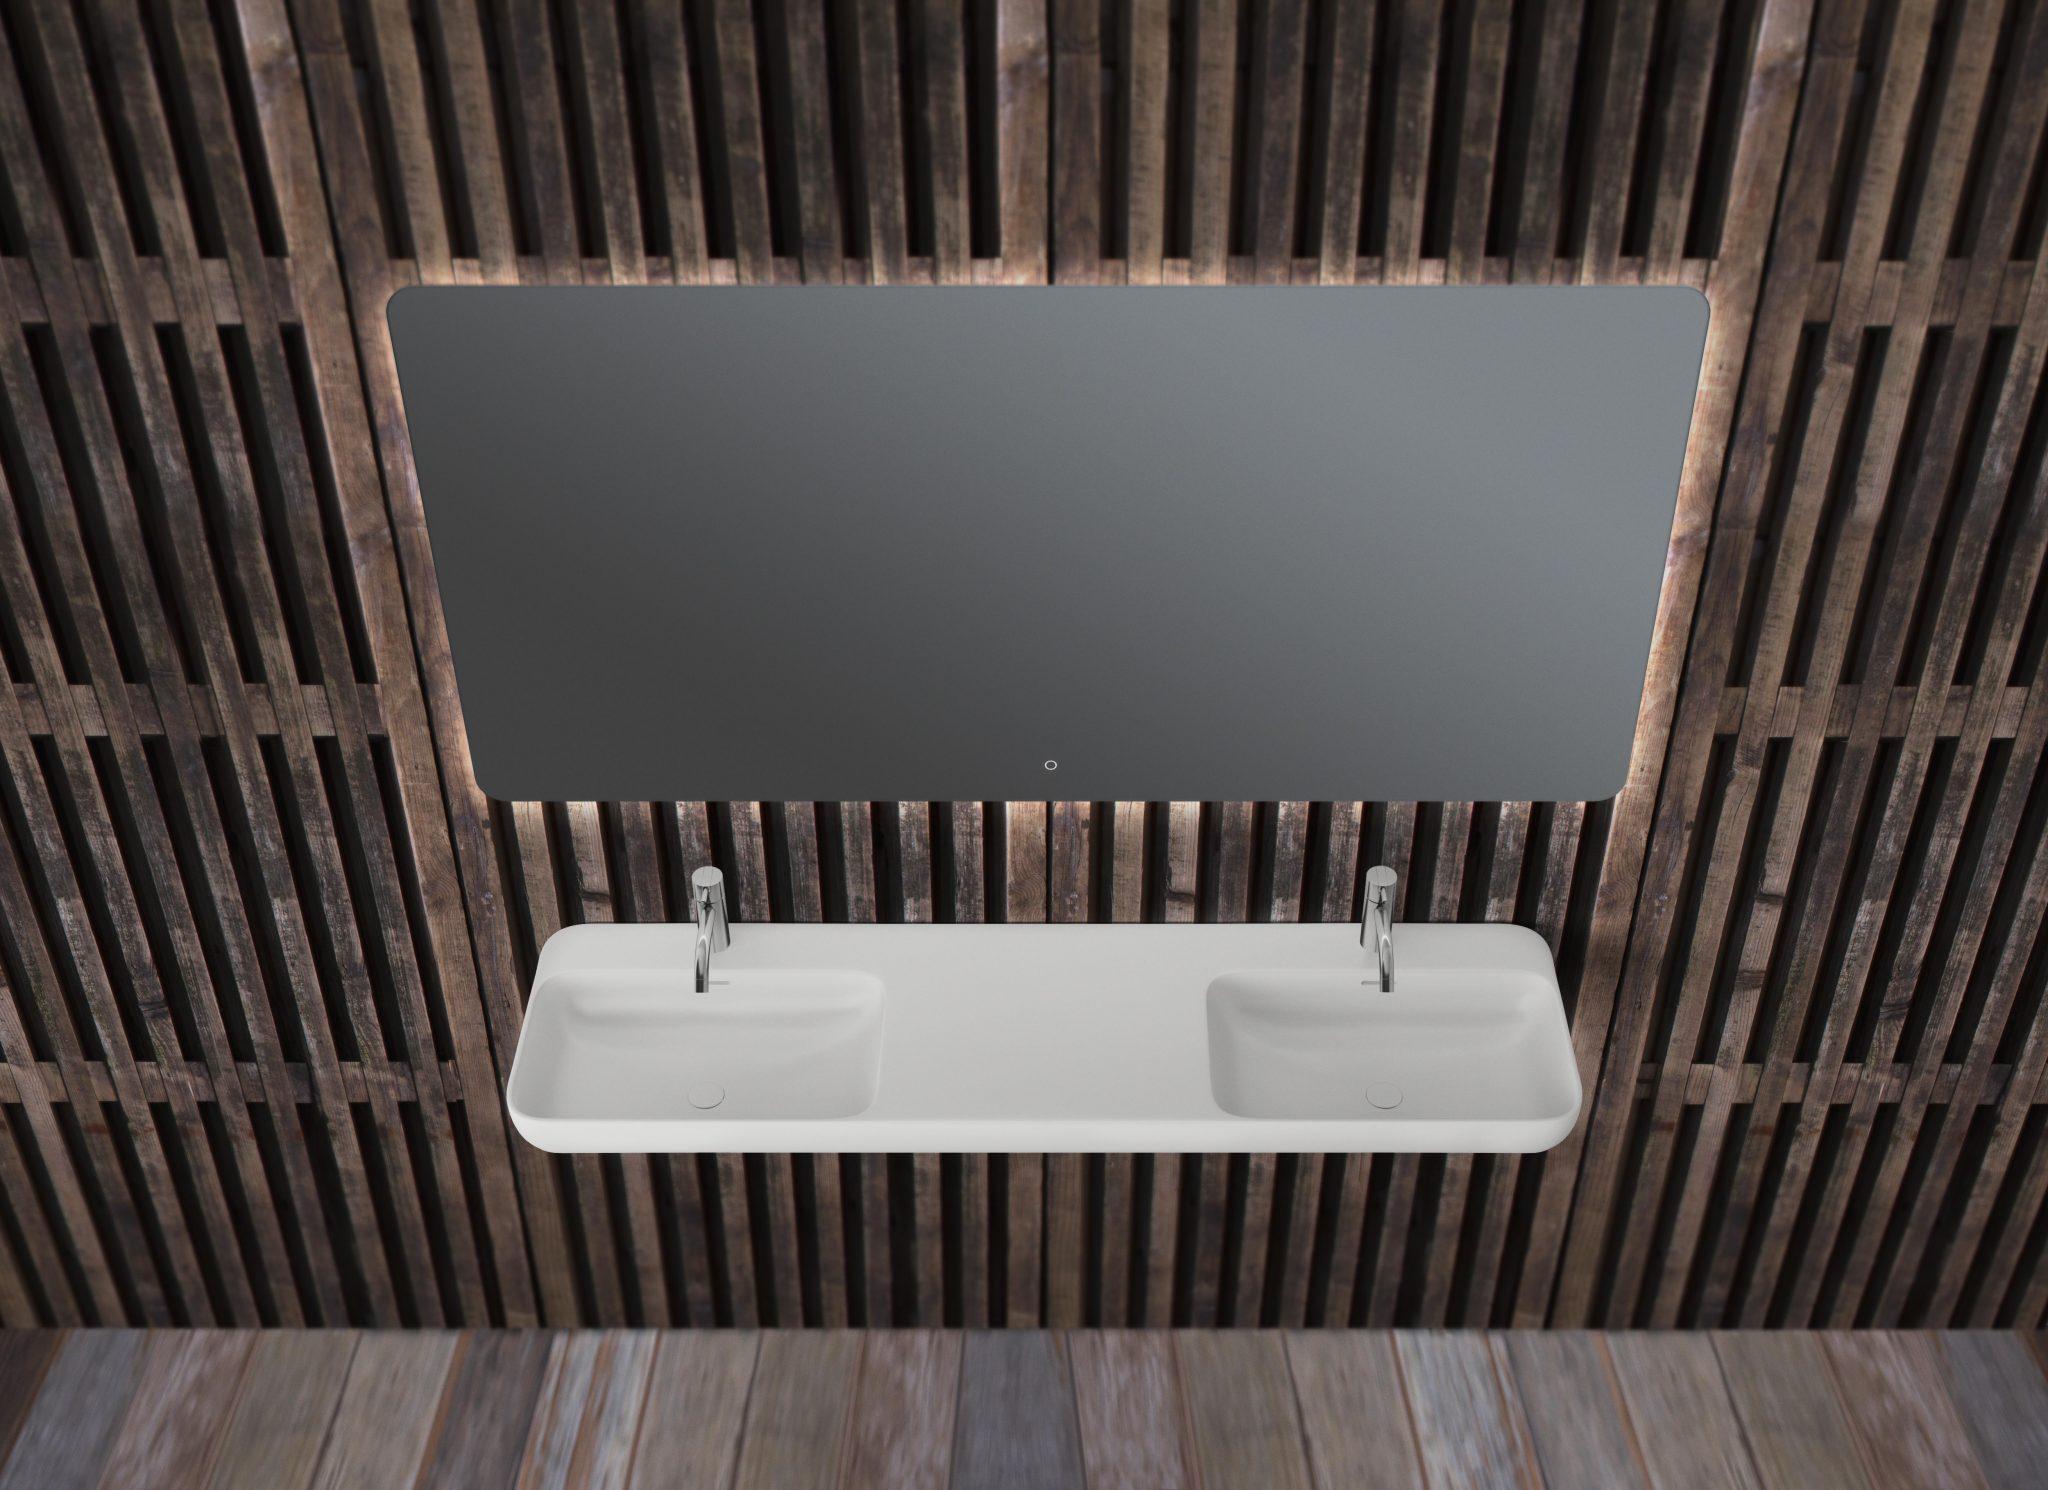 en-150-wash-basin-from-copenhagen-bath_28039227180_o